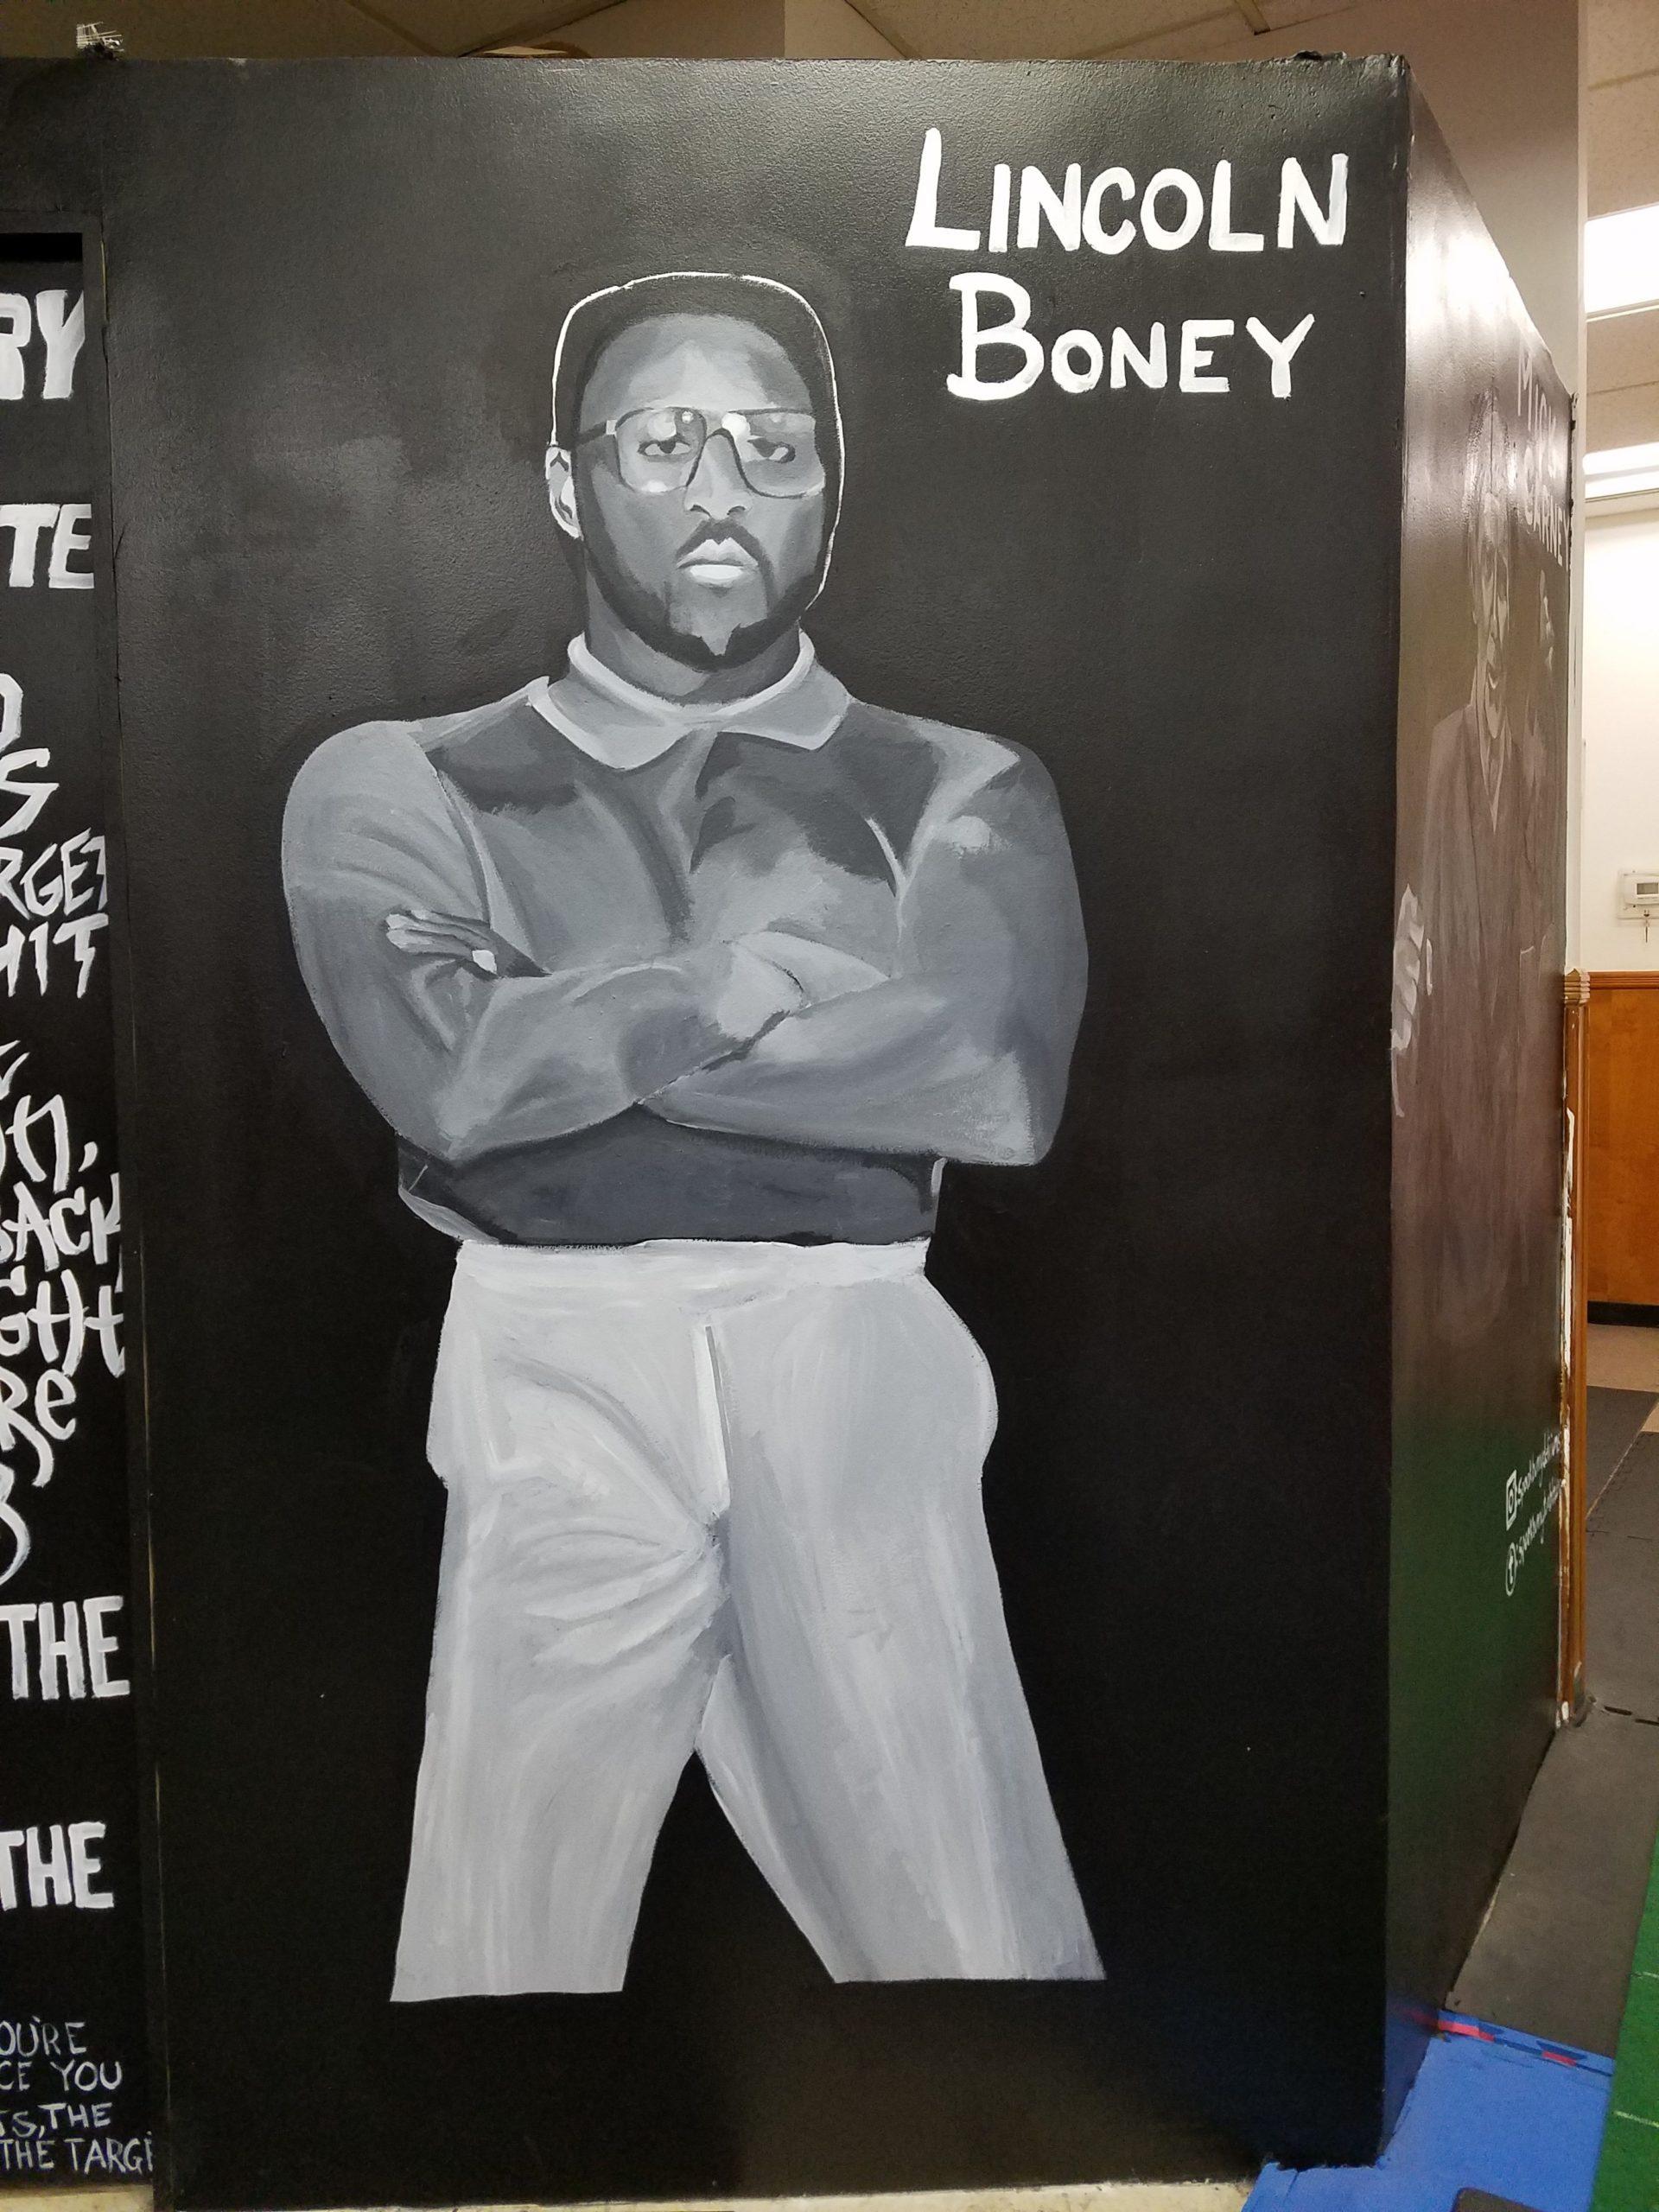 Lincoln Boney